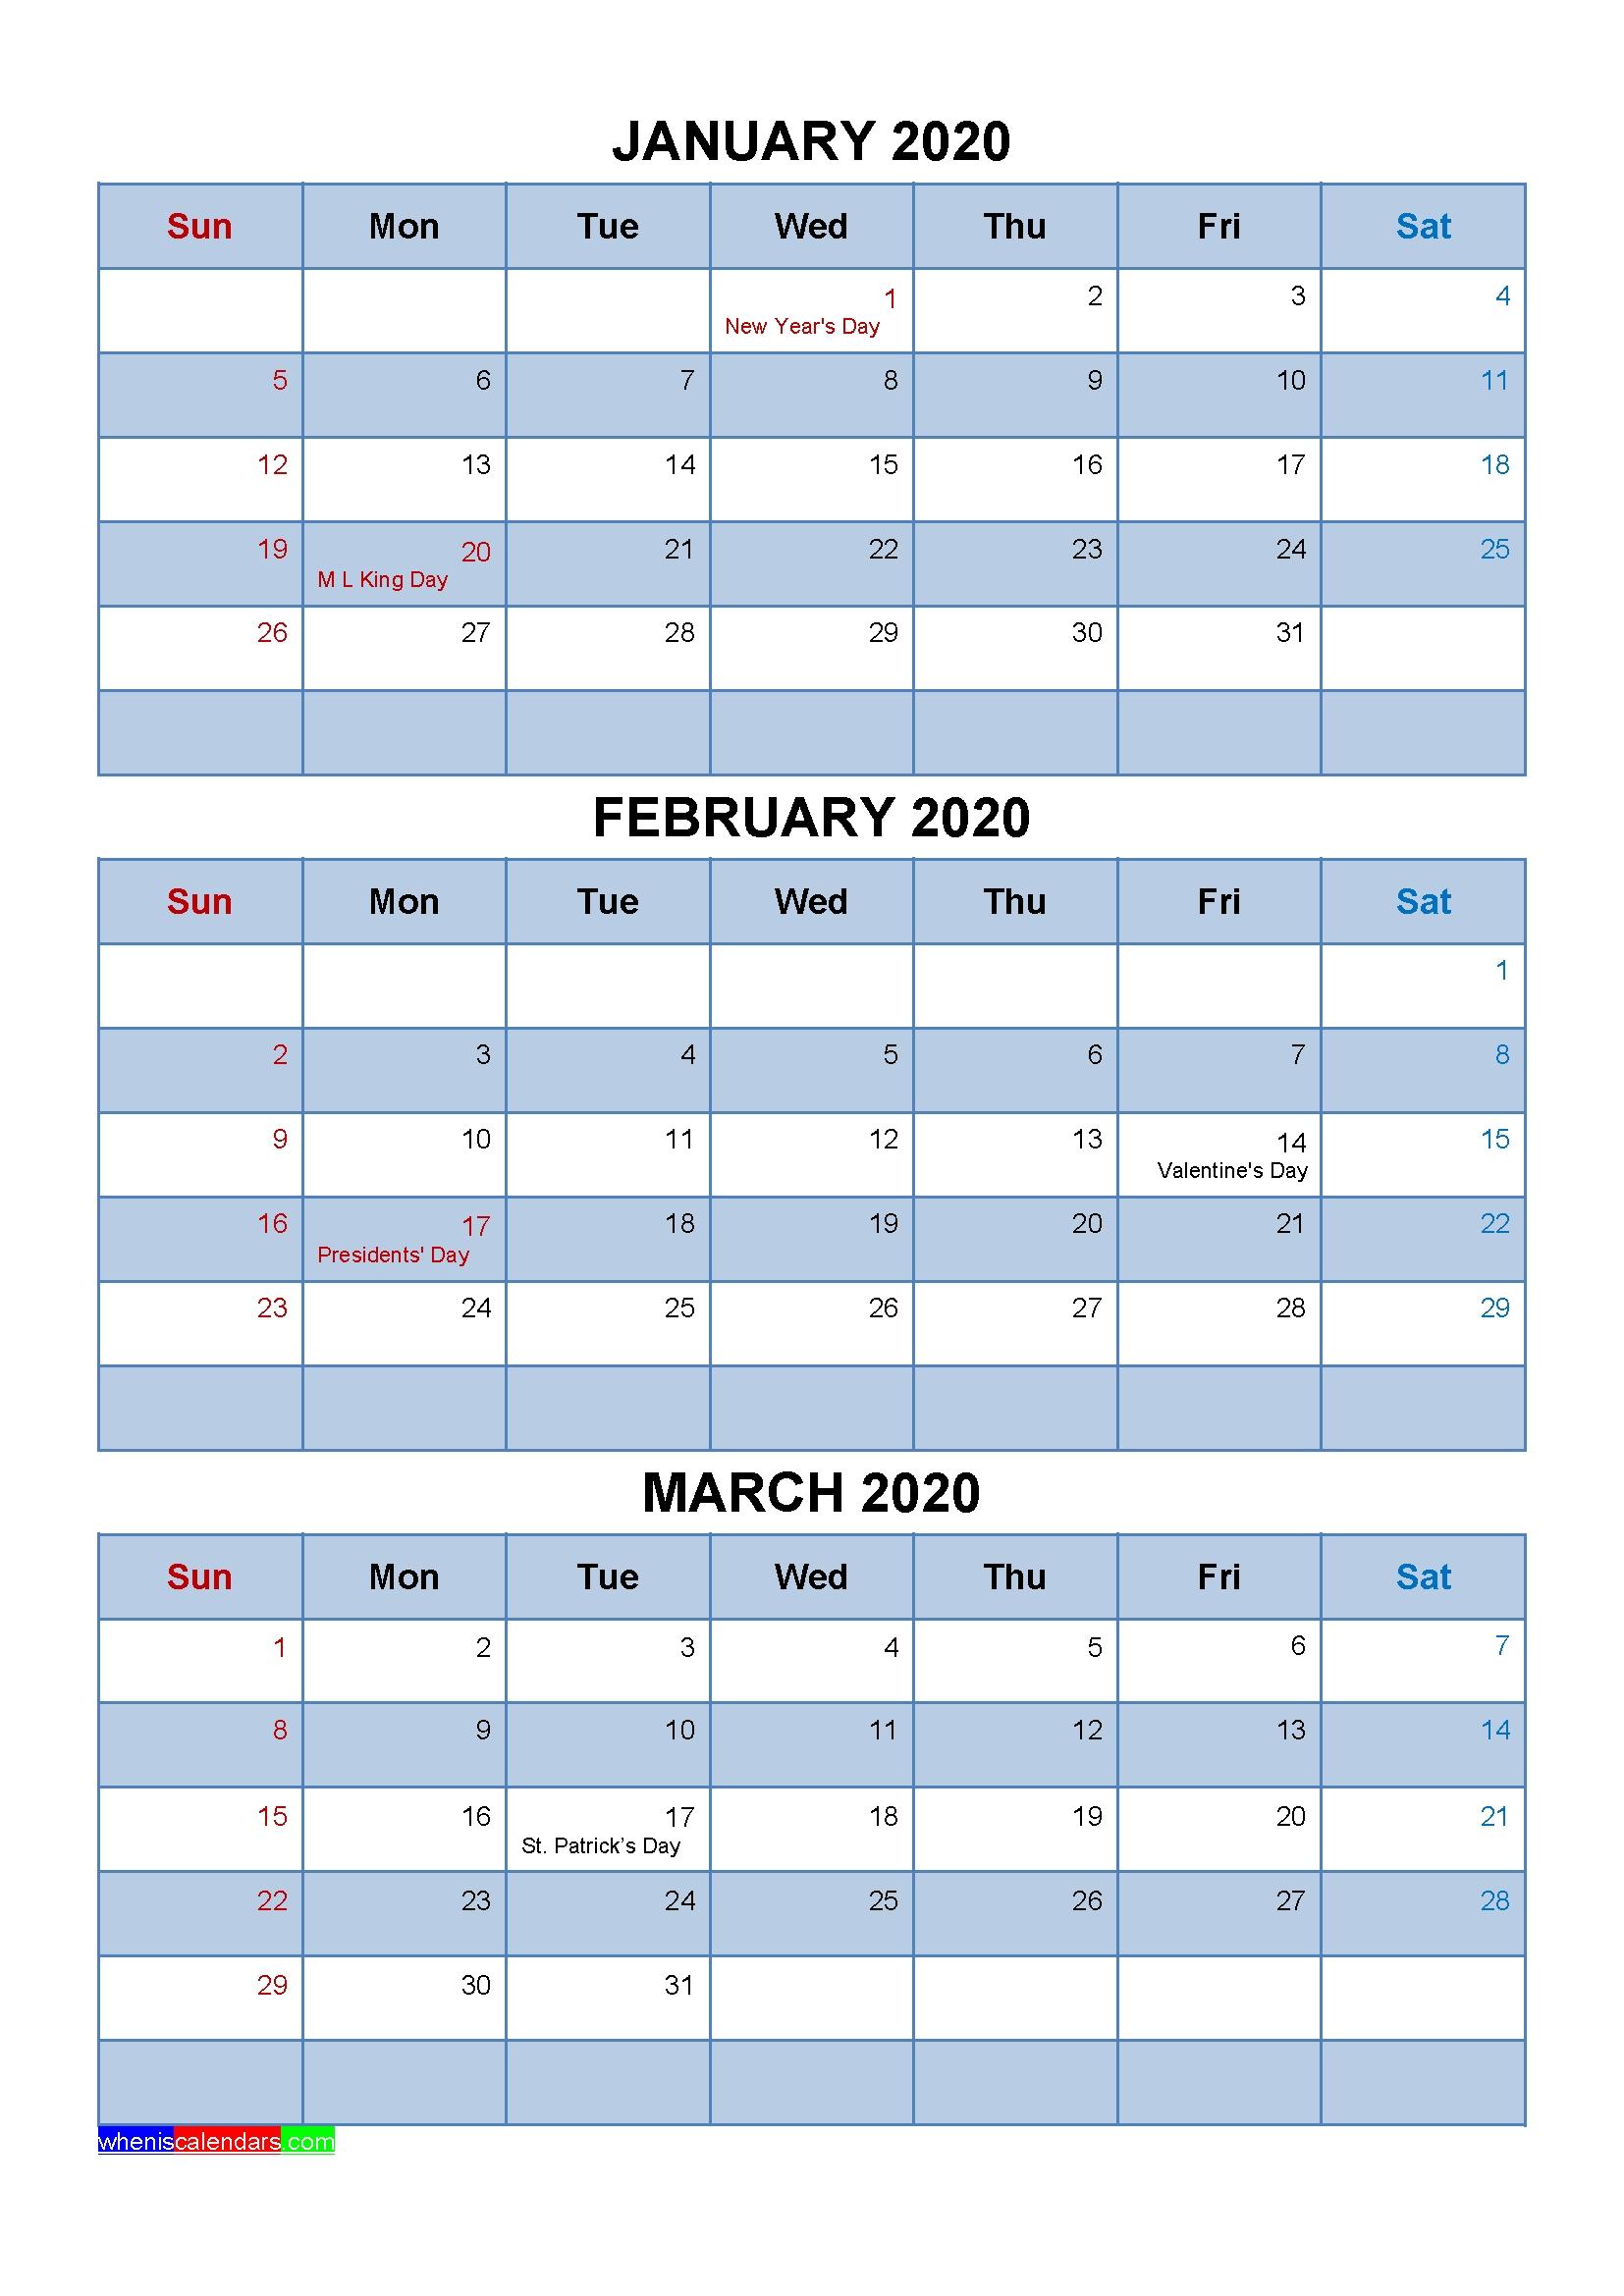 Free January February March 2020 Printable Calendar Template throughout 2020 Printable Quarterly Calendar Template